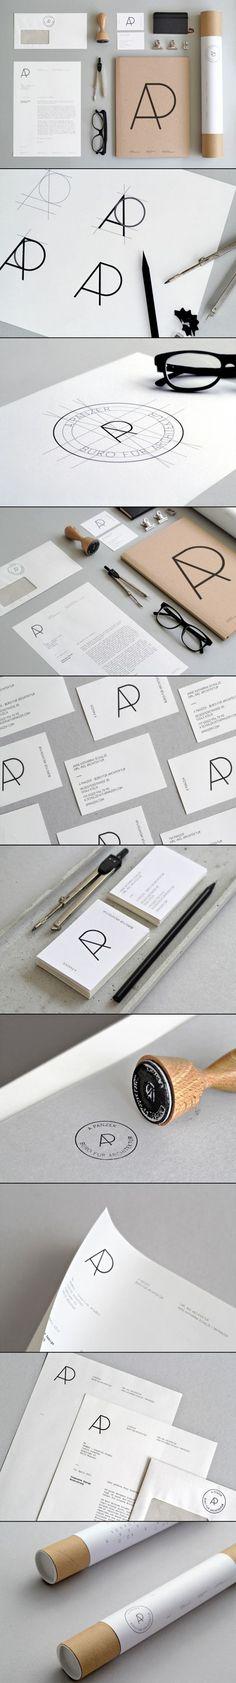 A Panzer, Büro für Architektur Brand Identity via Design made in Germany.